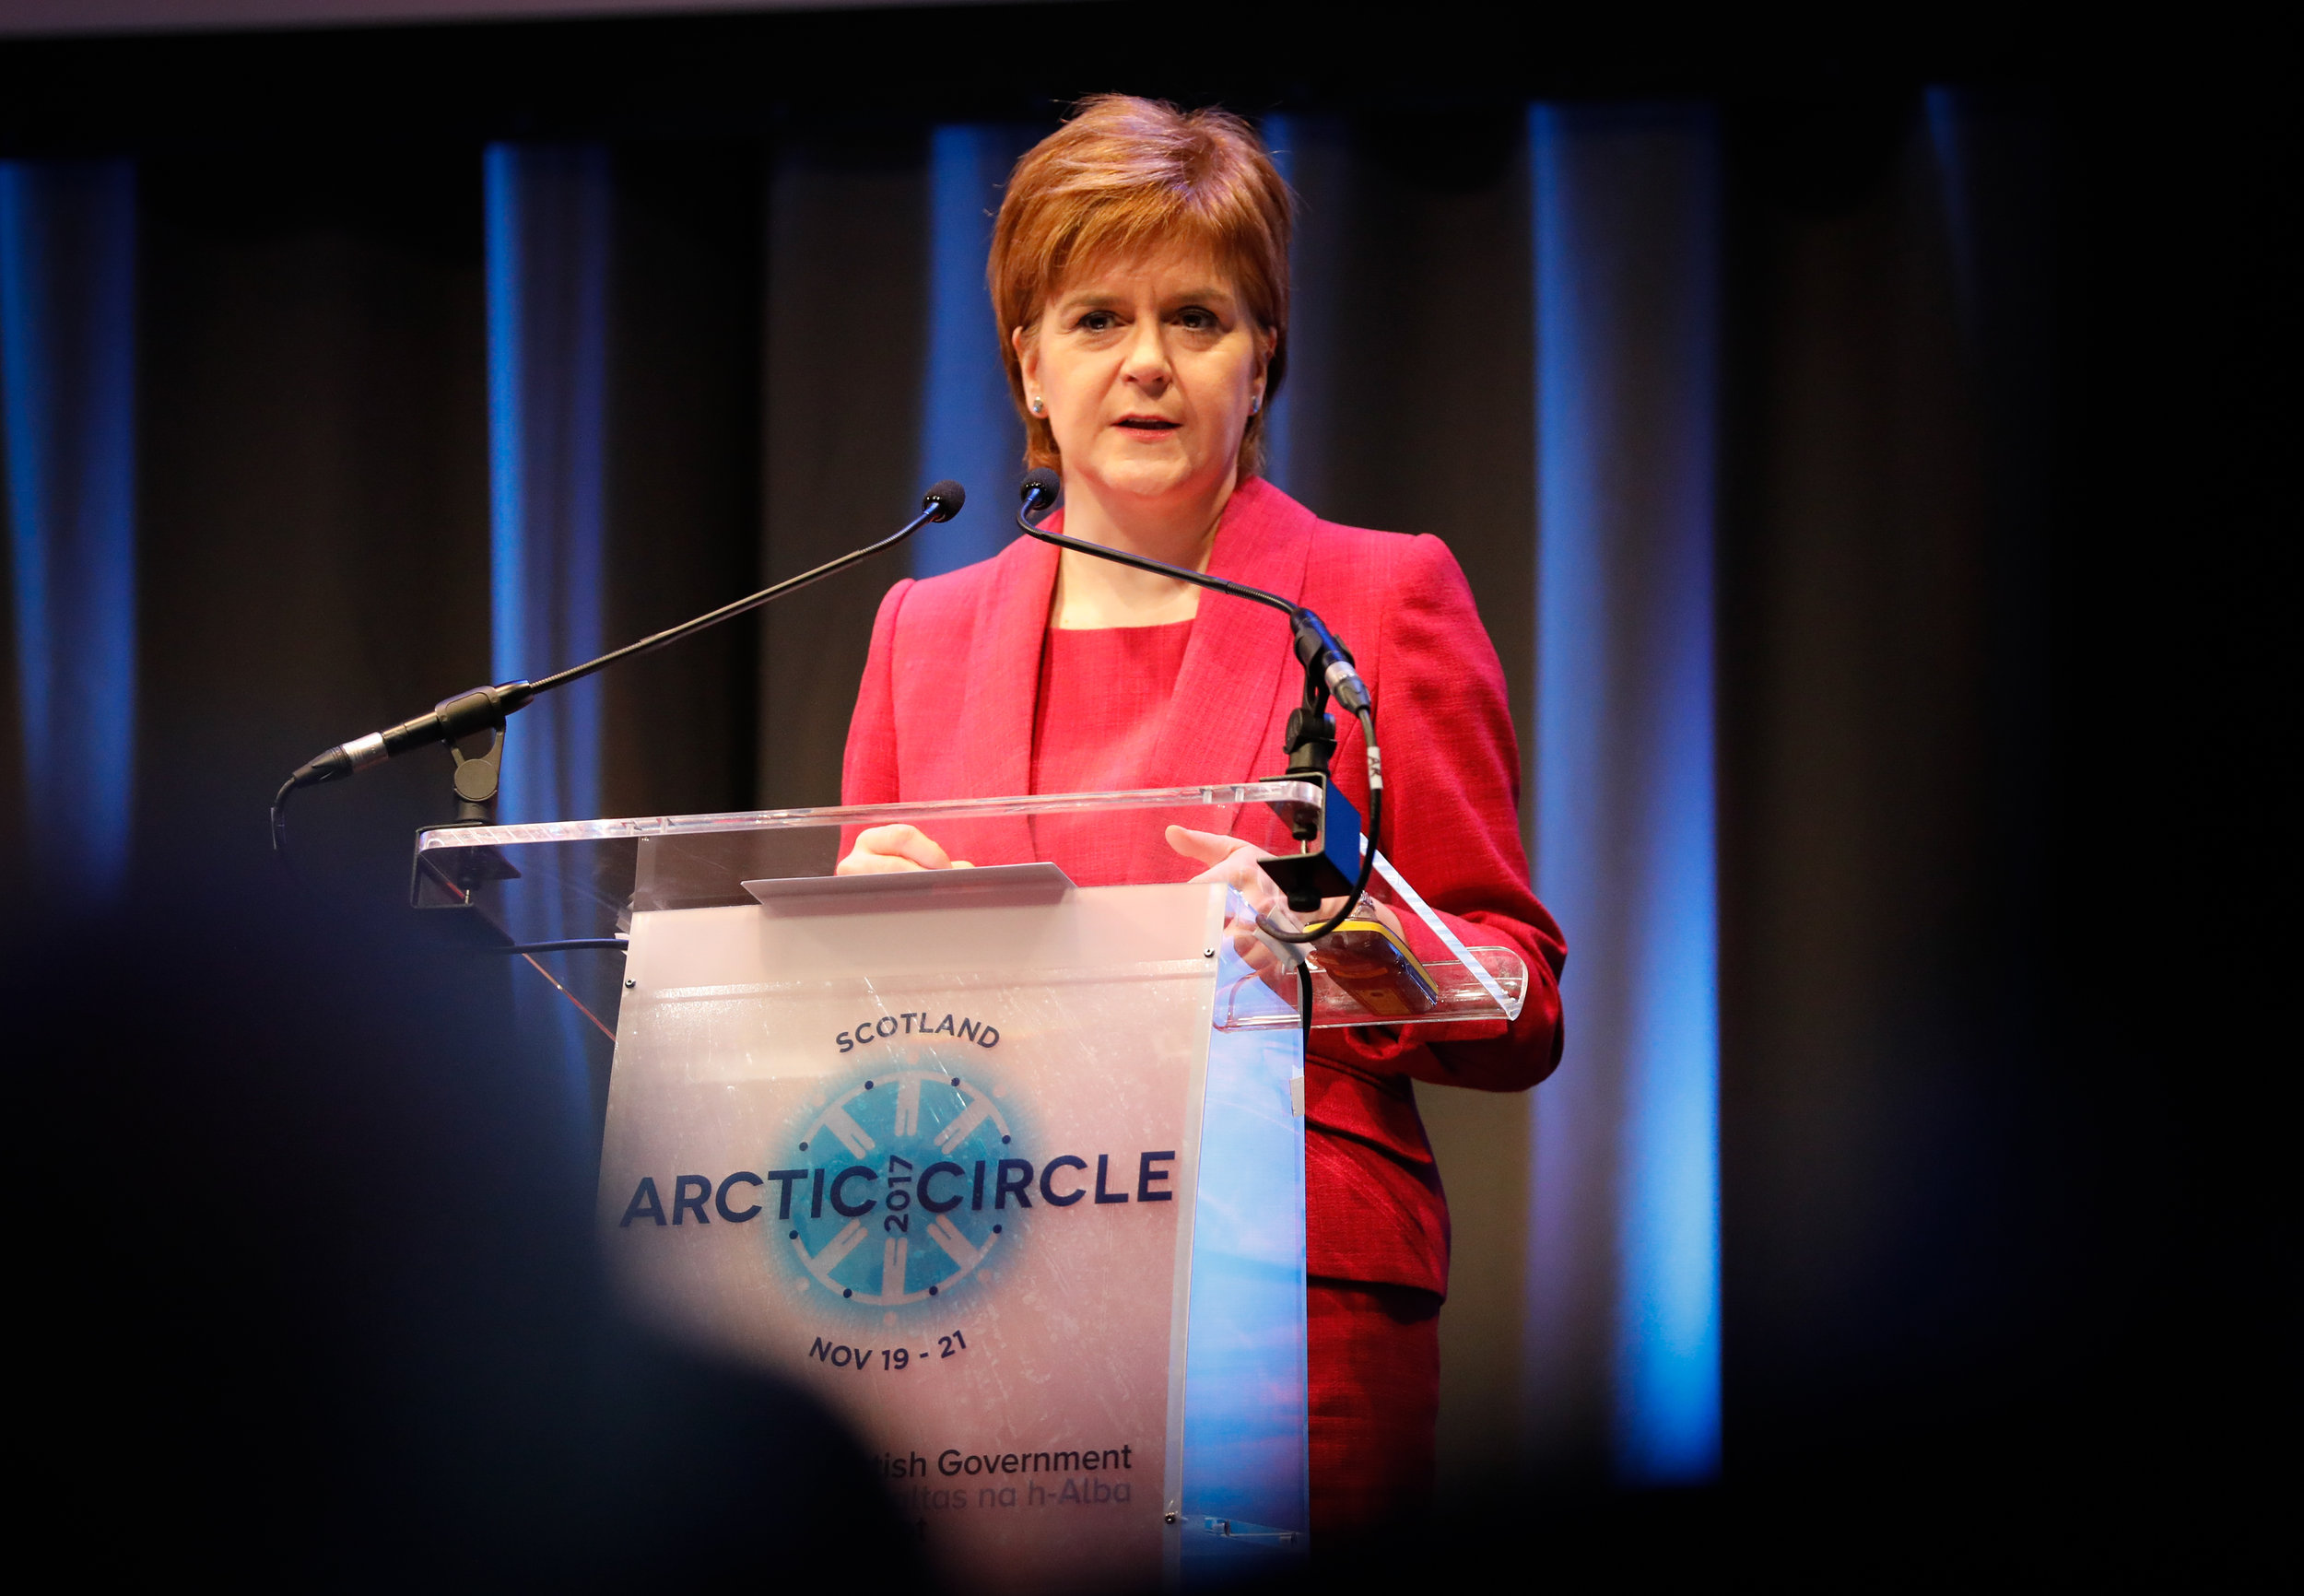 The First Minister, Nicola Sturgeon speaking in Edinburgh. ©Arctic Circle